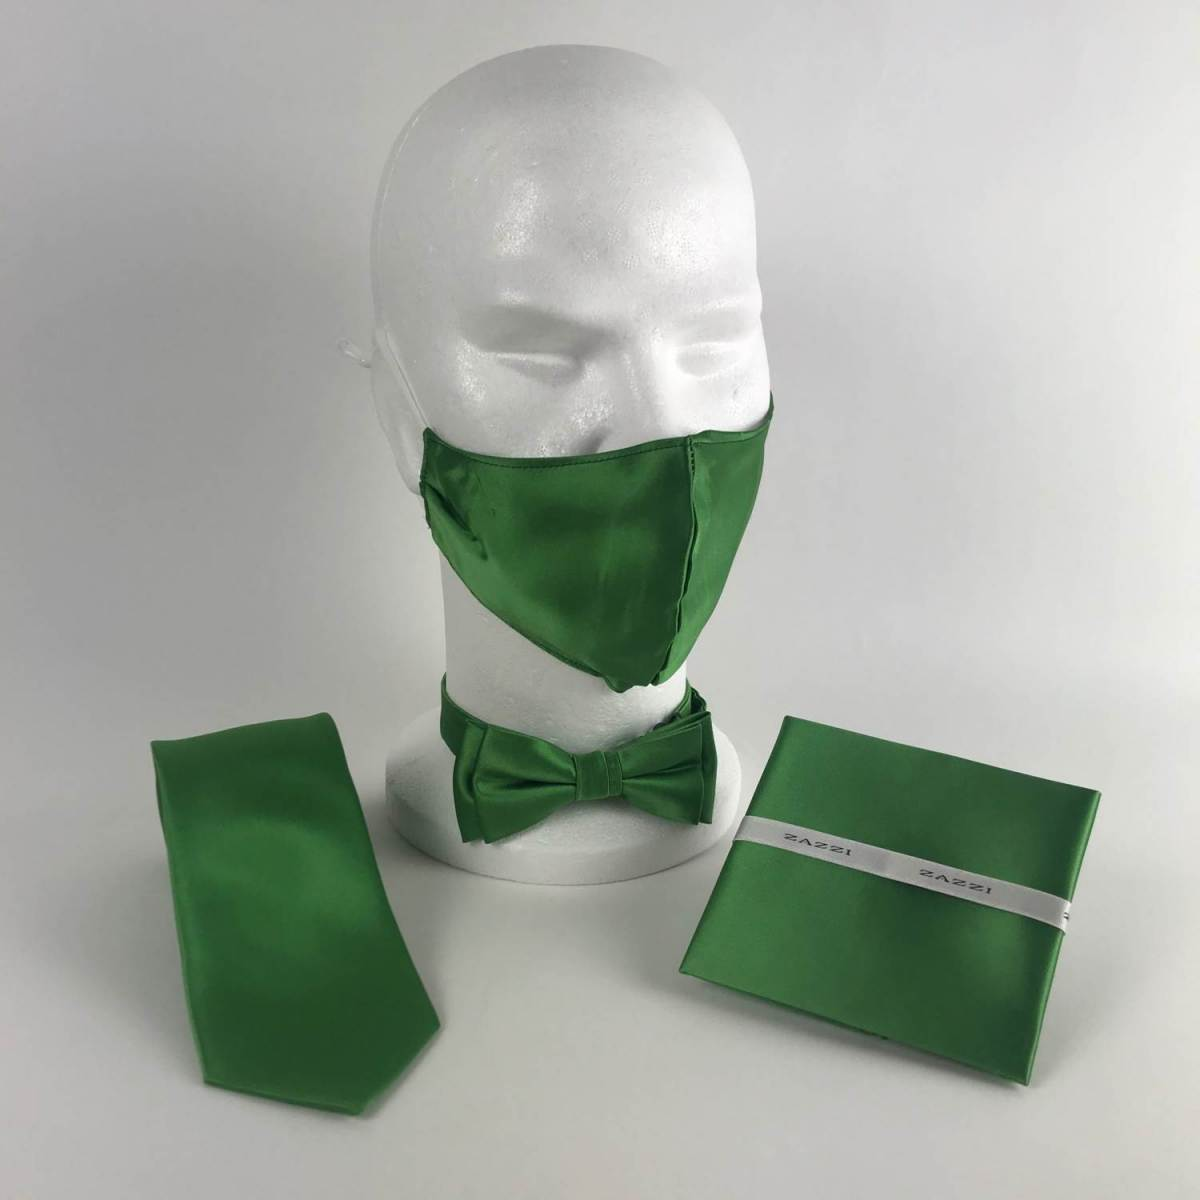 B1764 14 Grass FM. mens ties facemasks con murphys menswear cork scaled - - Con Murphys Menswear